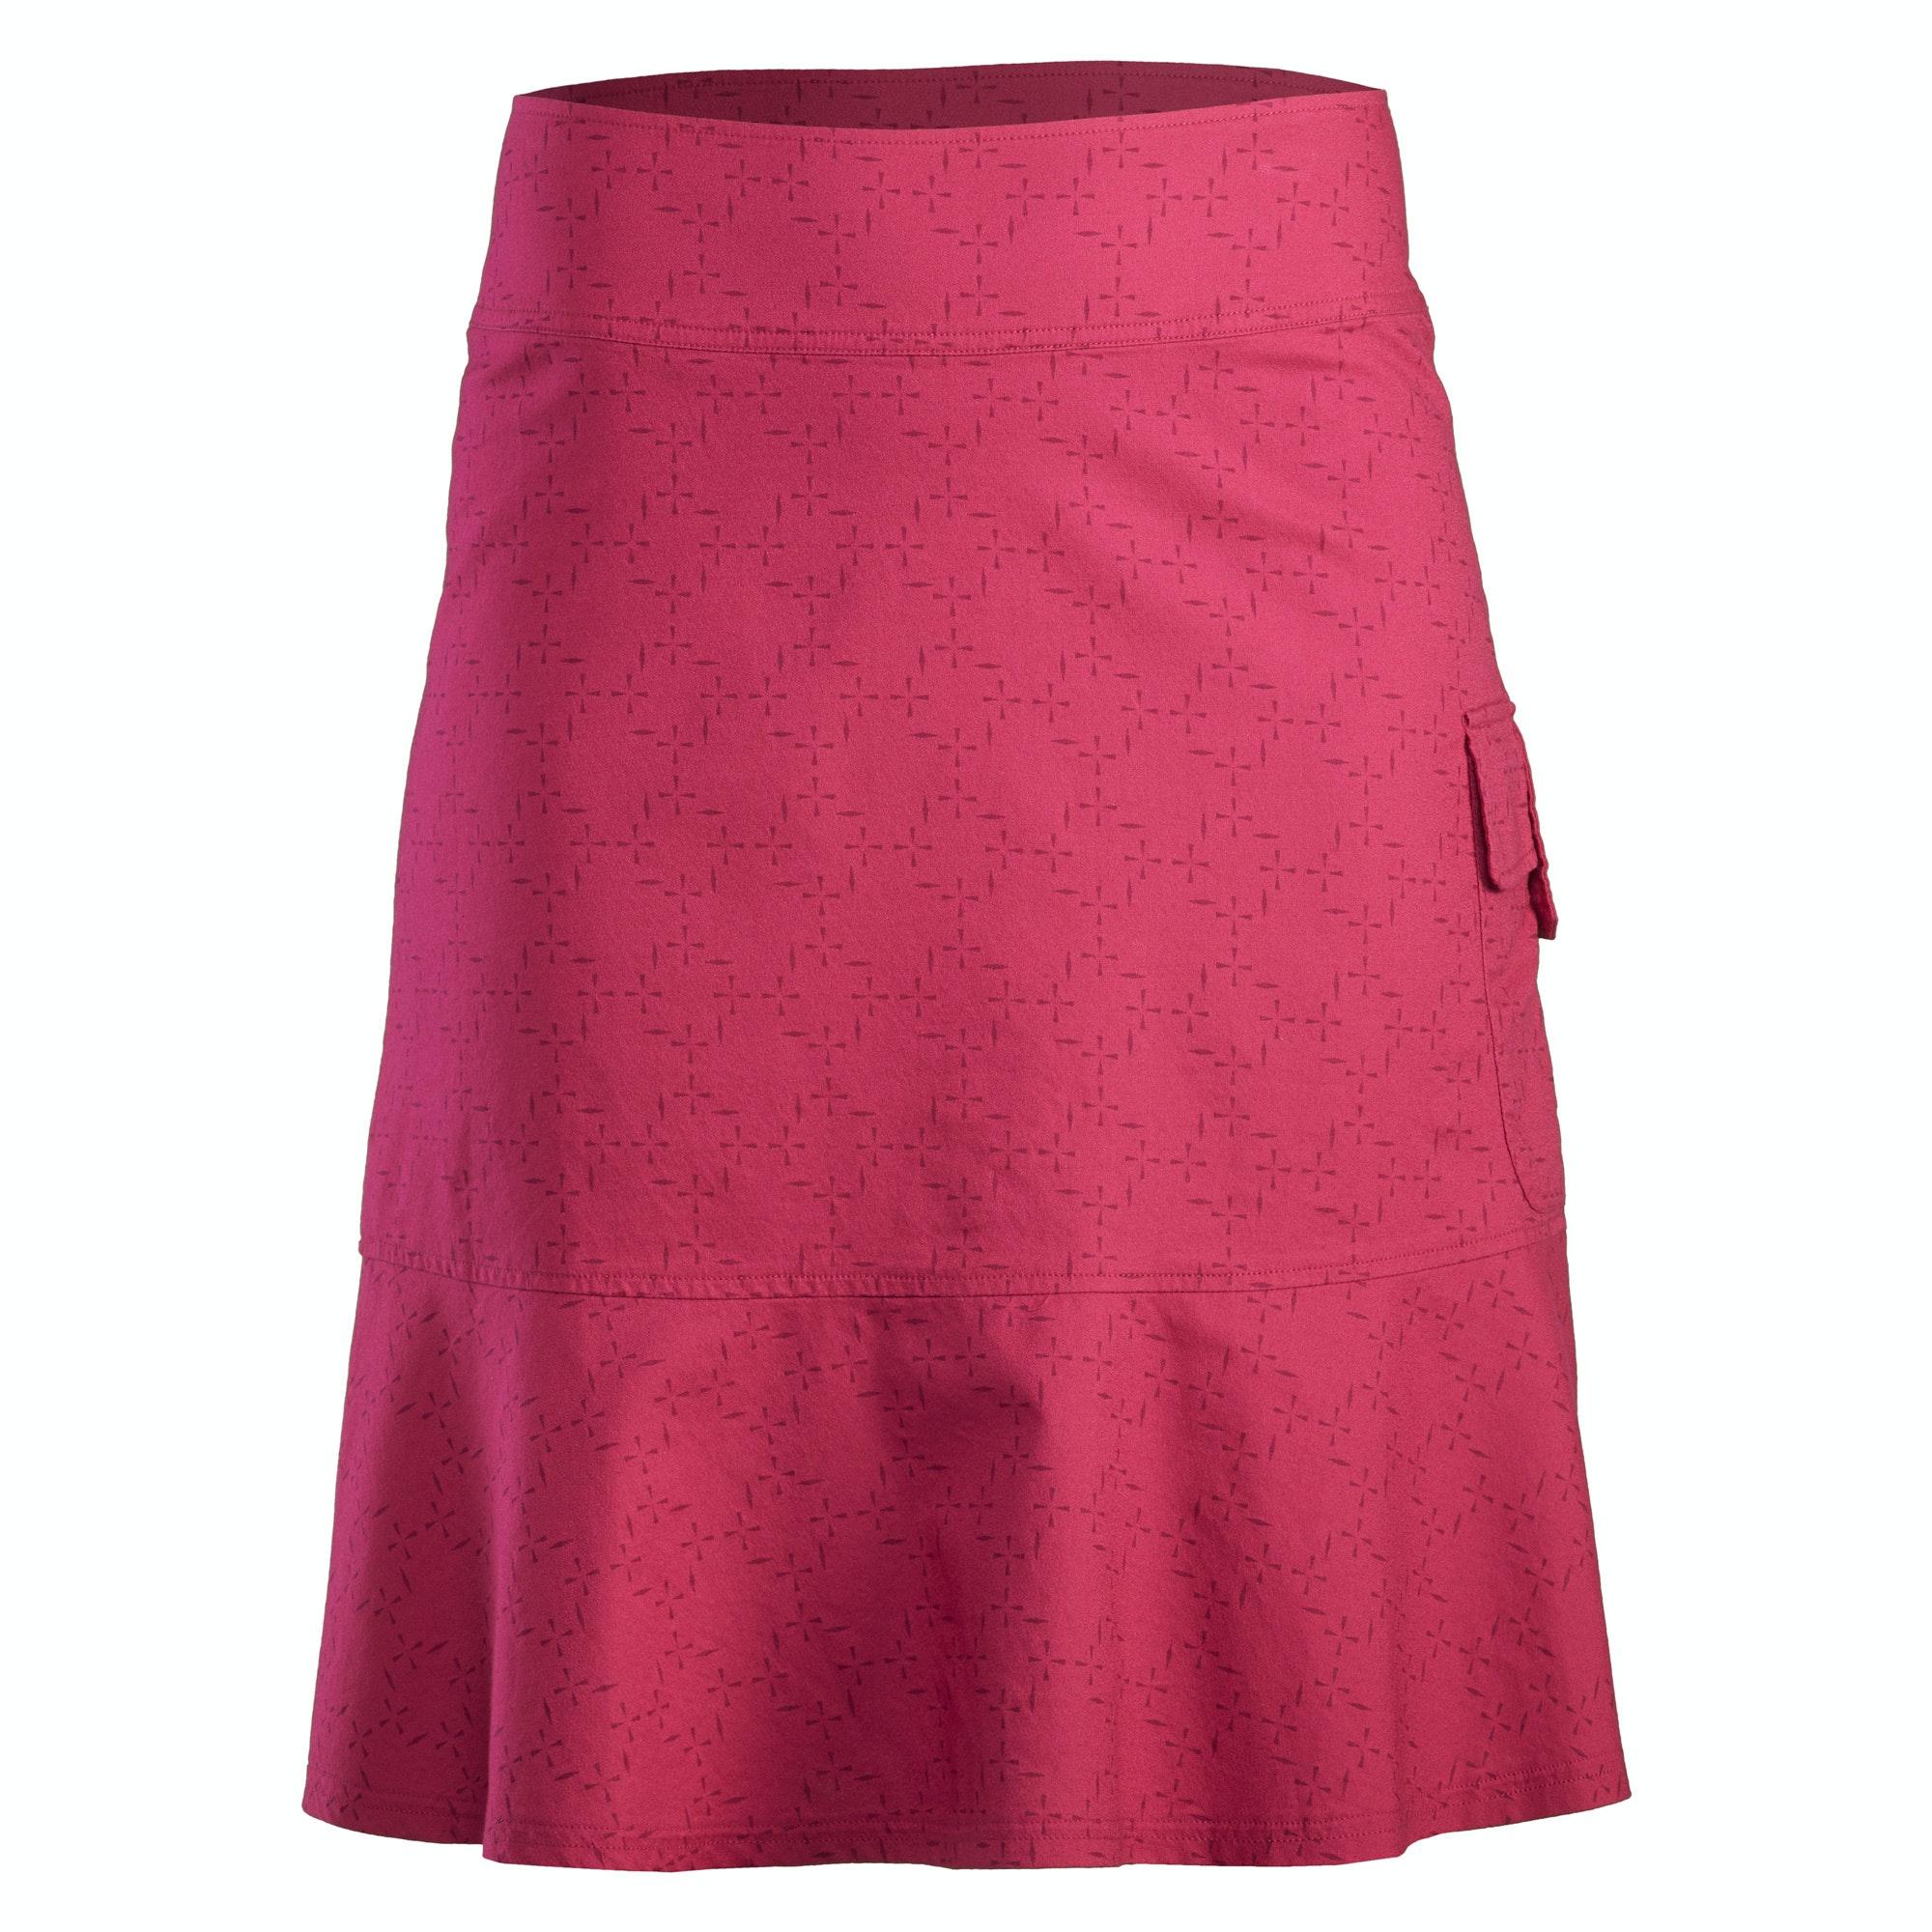 Melfi Women's Travel Skirt - Driftwood Print